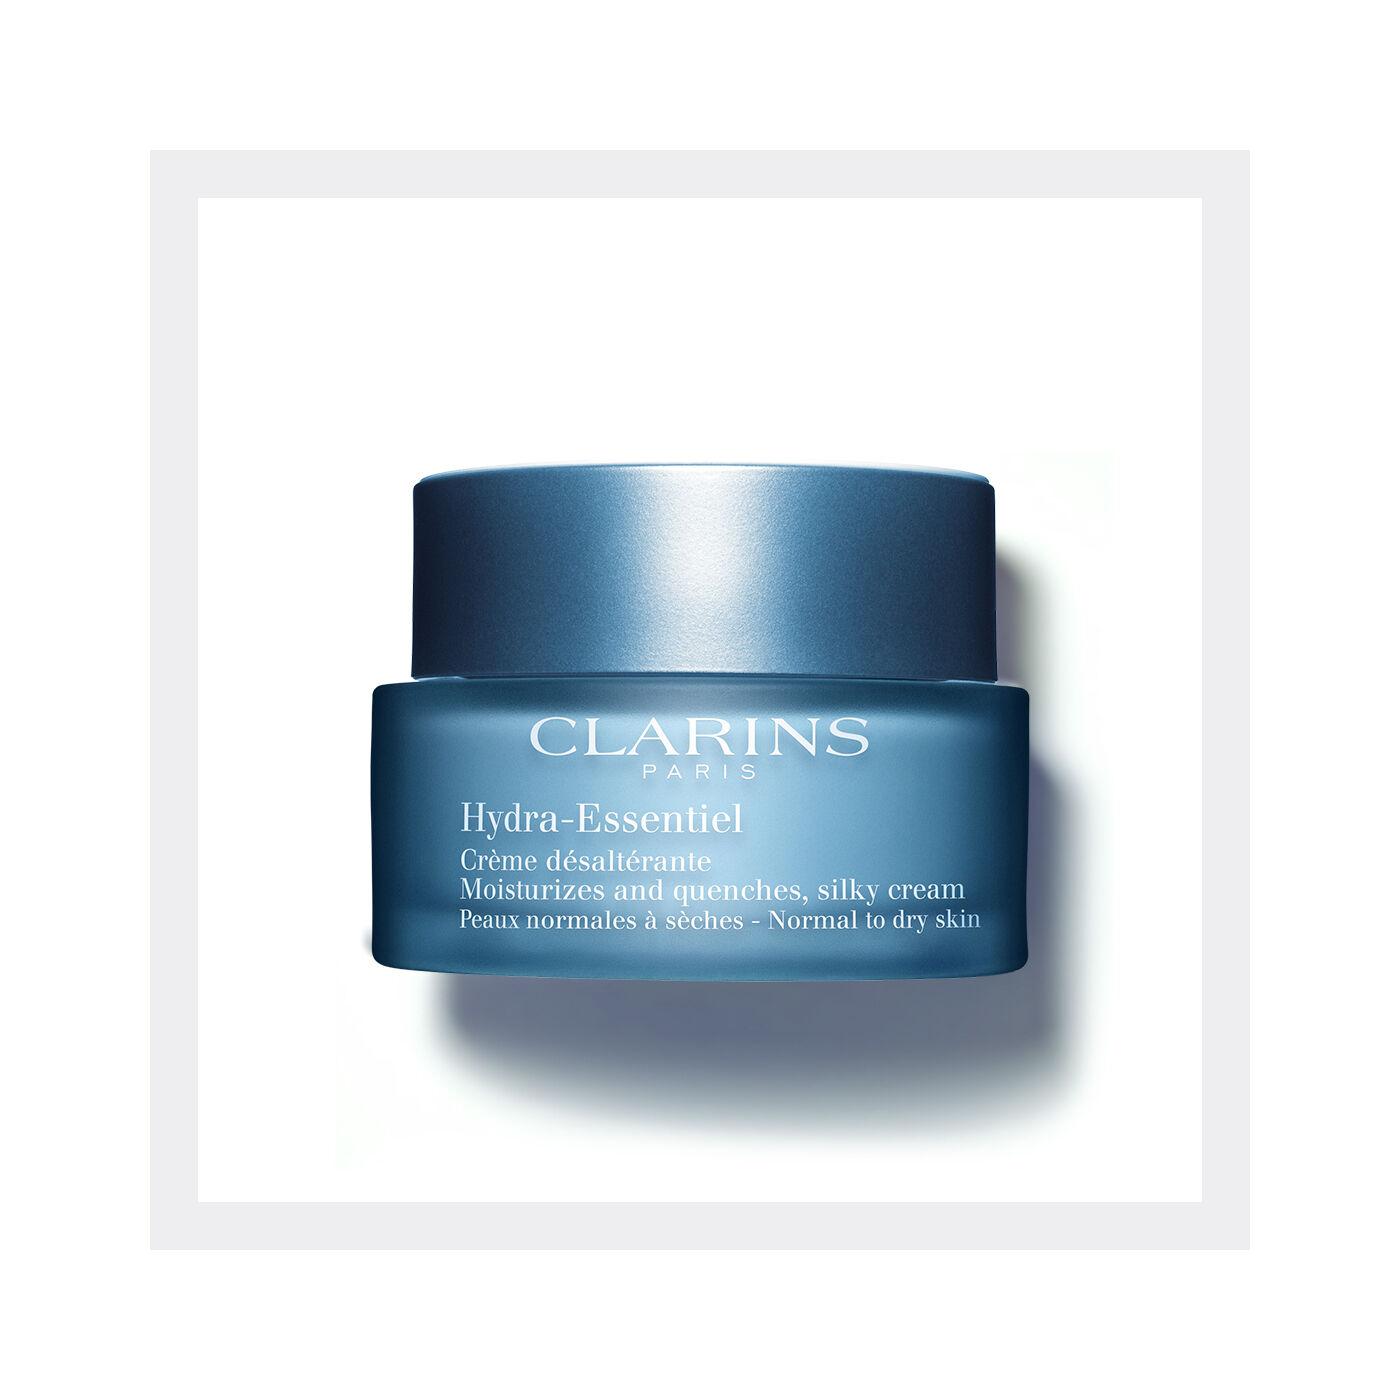 NEW Hydra-Essentiel Hydra-Essentiel Silky Cream (Normal to Dry Skin)